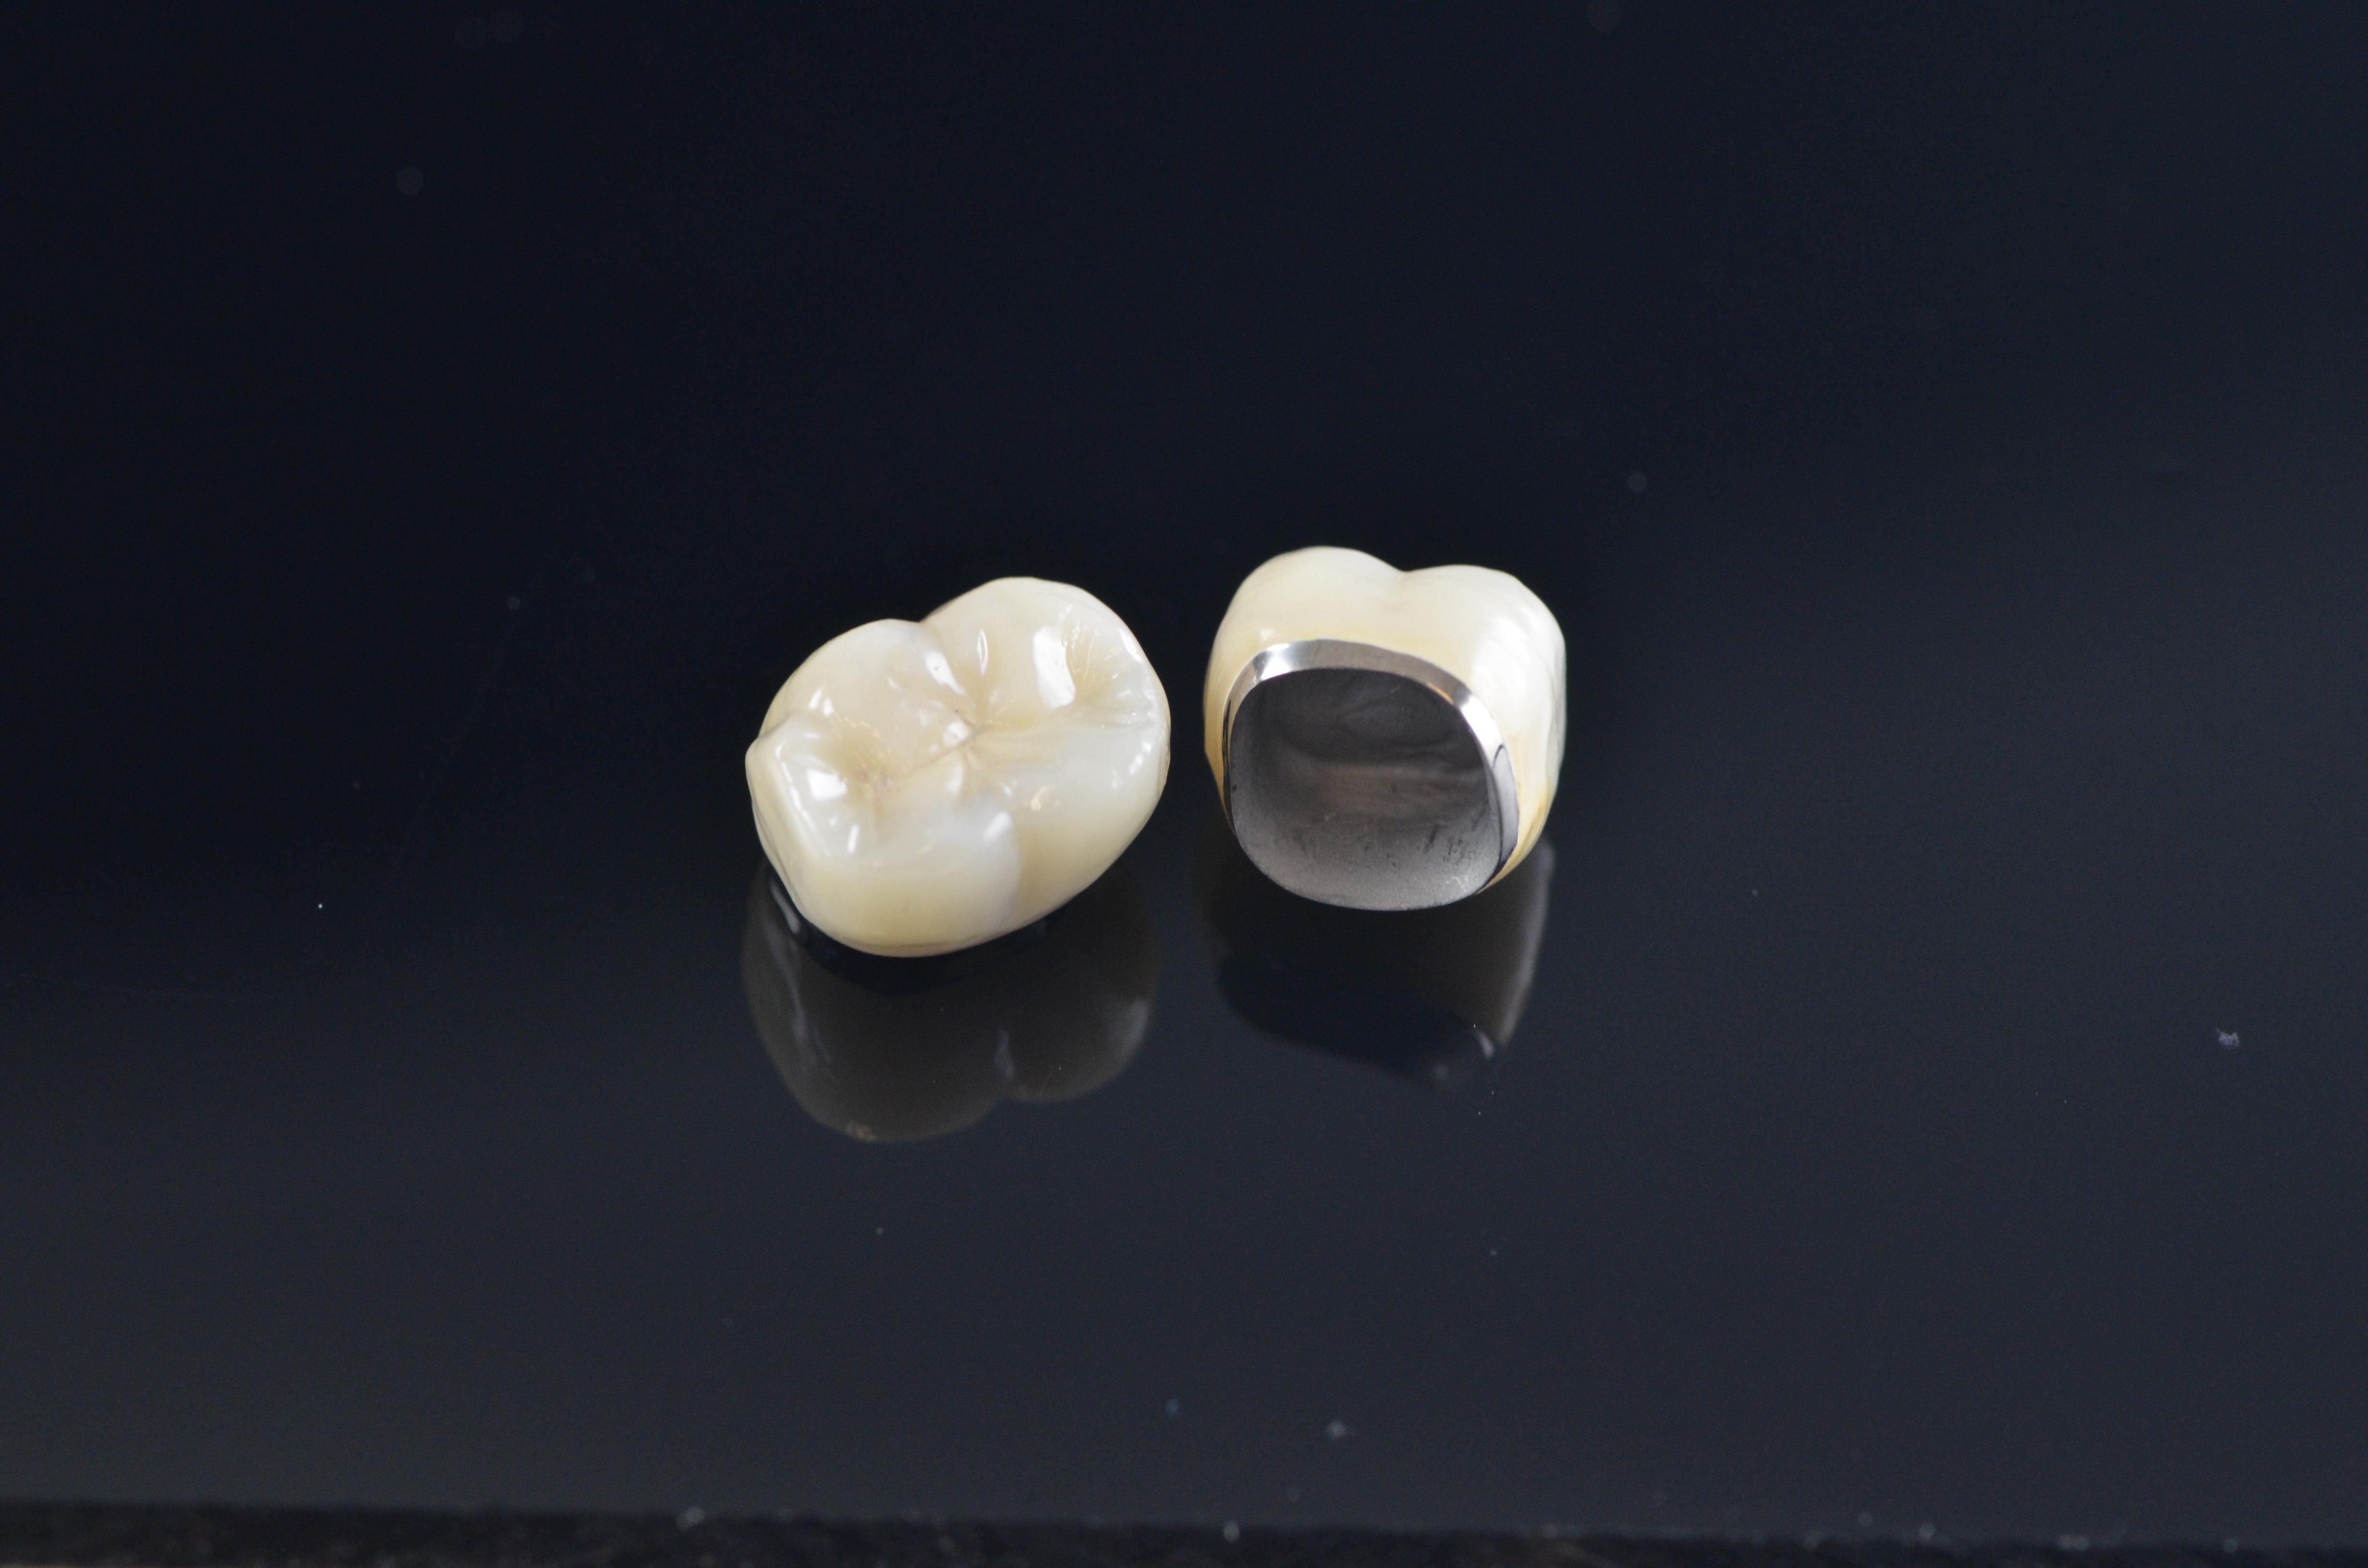 Oral Arts Porcelain Fused To Metal Oral Arts Dental